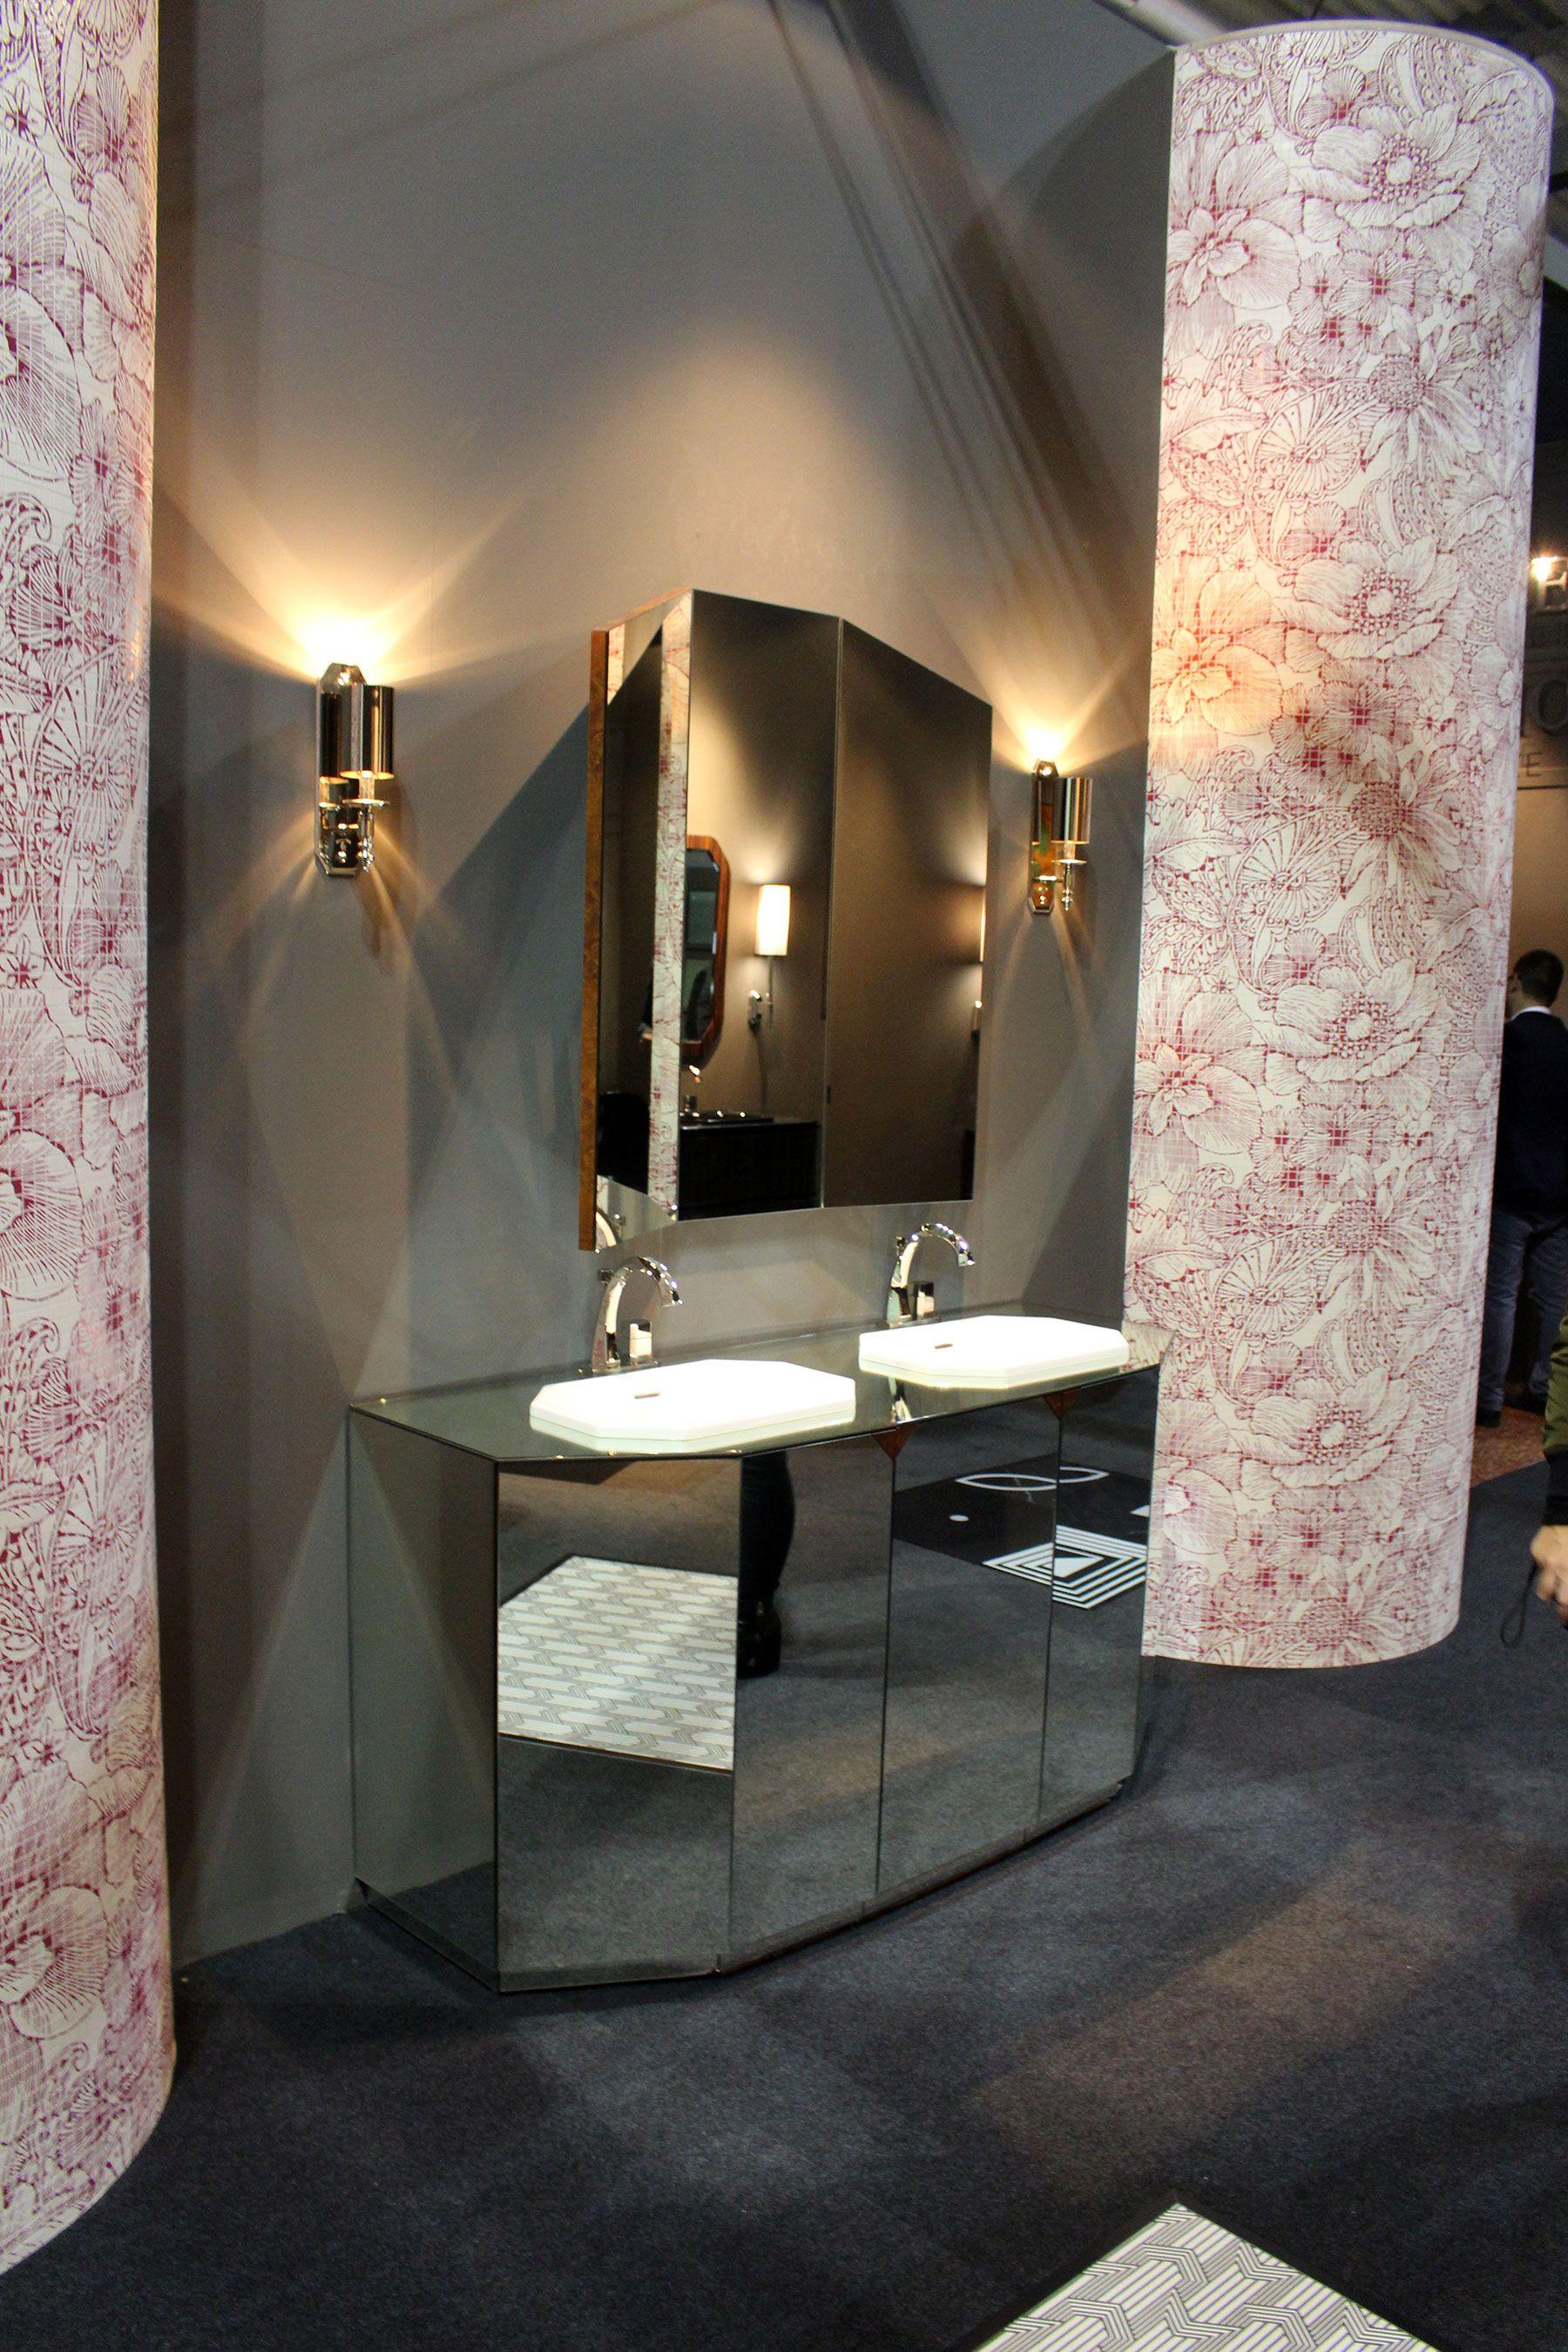 Petracer's luxury bathroom furniture at Salone del Mobile #bathrooms #bathroominspiration #salone2016 #salonedelmobile #bathroomfurniture